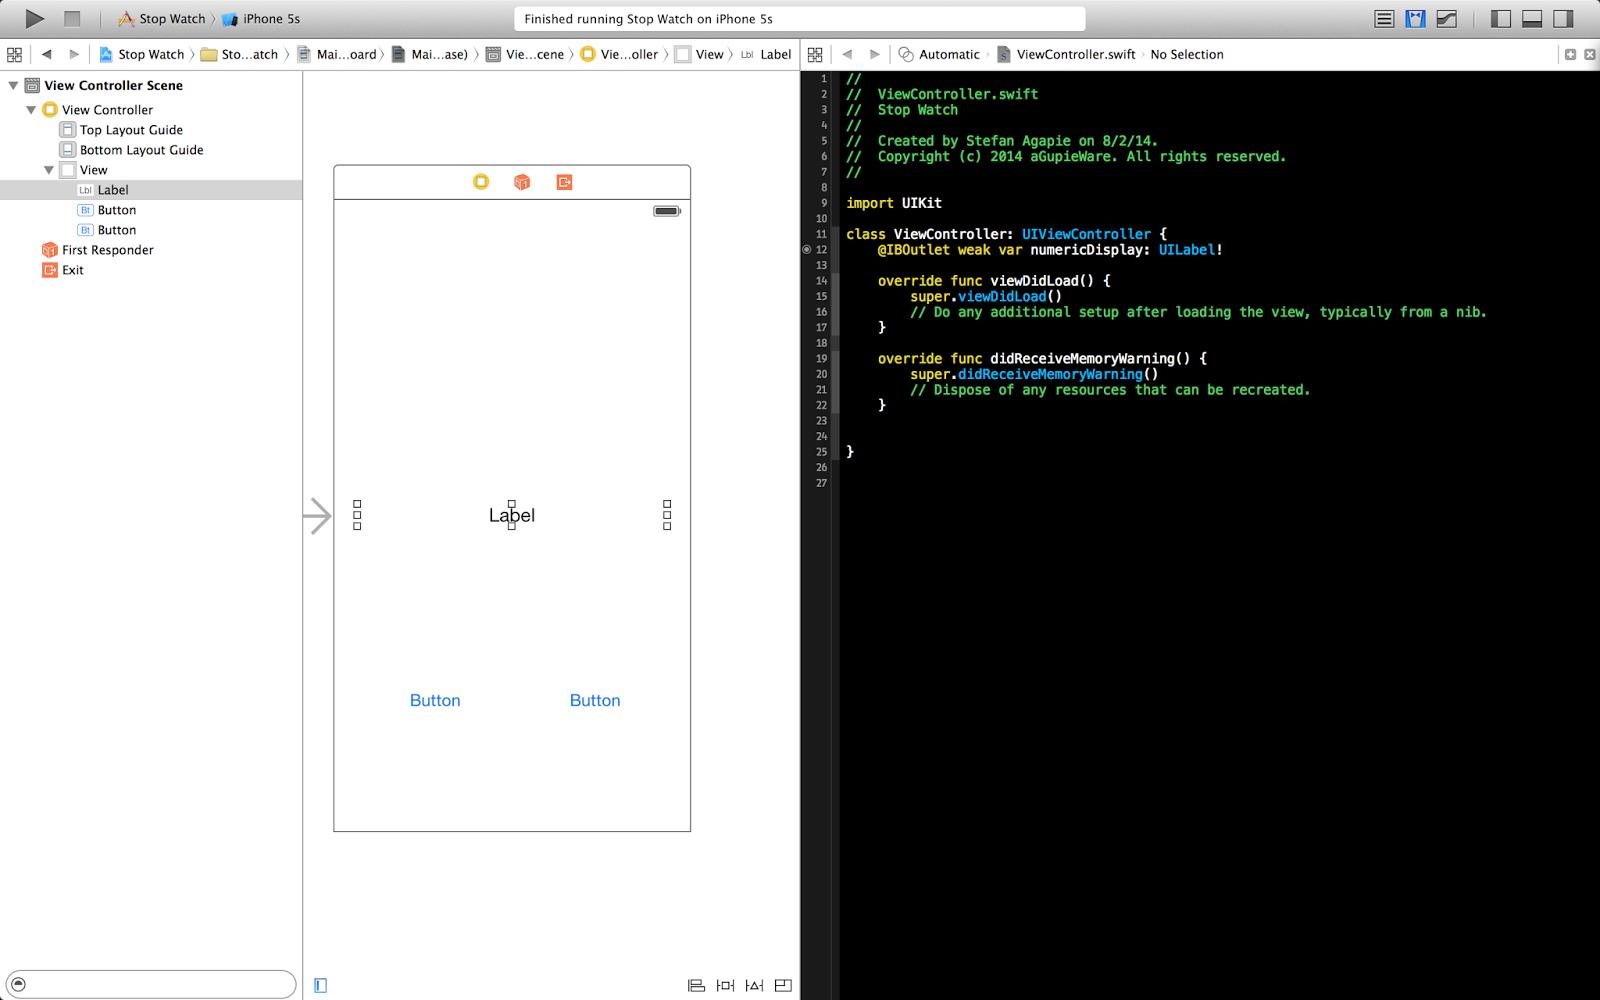 aGupieWare: Tutorial: A Simple iOS Stopwatch App in Swift